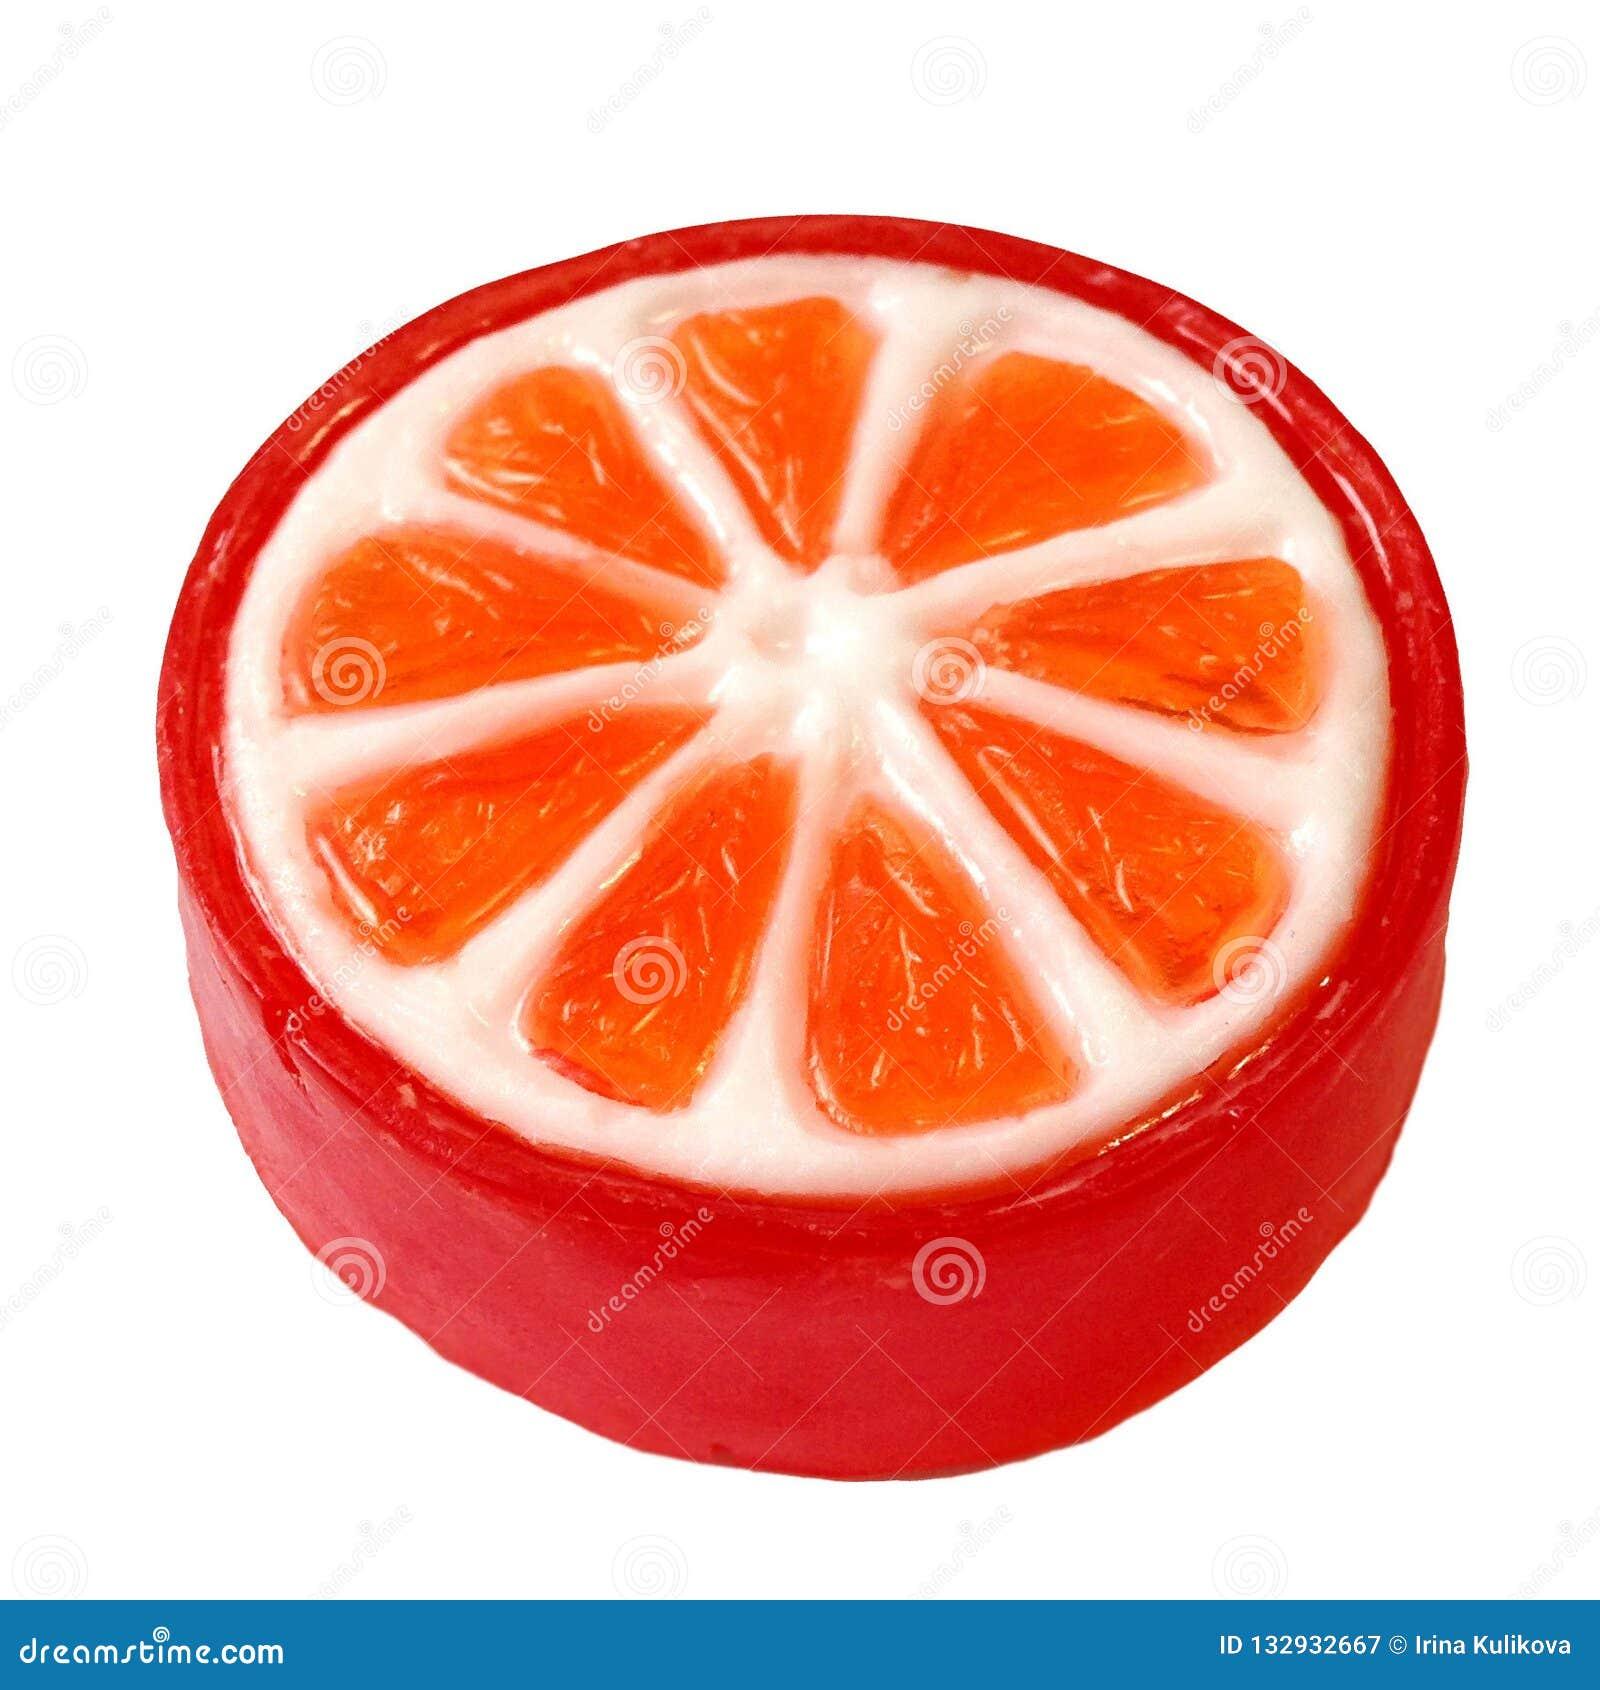 Isolerad ljus handgjord tvål i form av en skiva av apelsinen